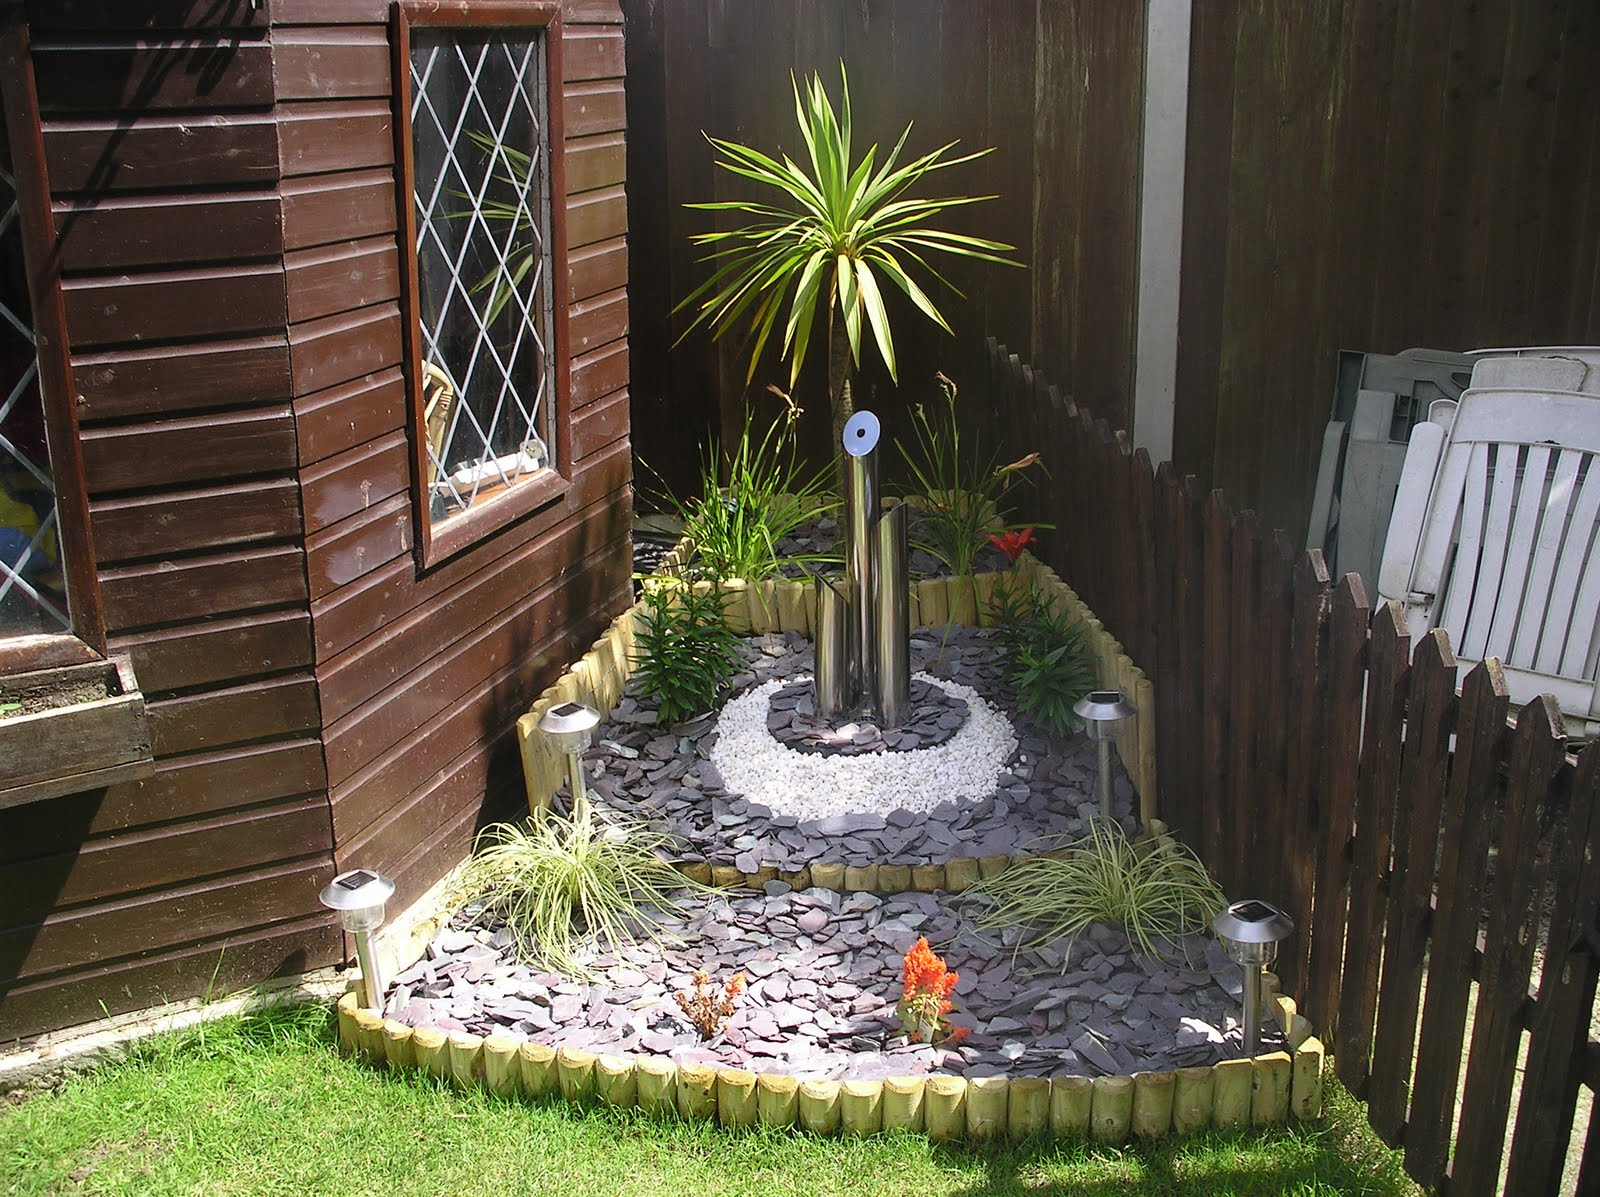 A Garden Feature Featuring A Garden Water Feature And A